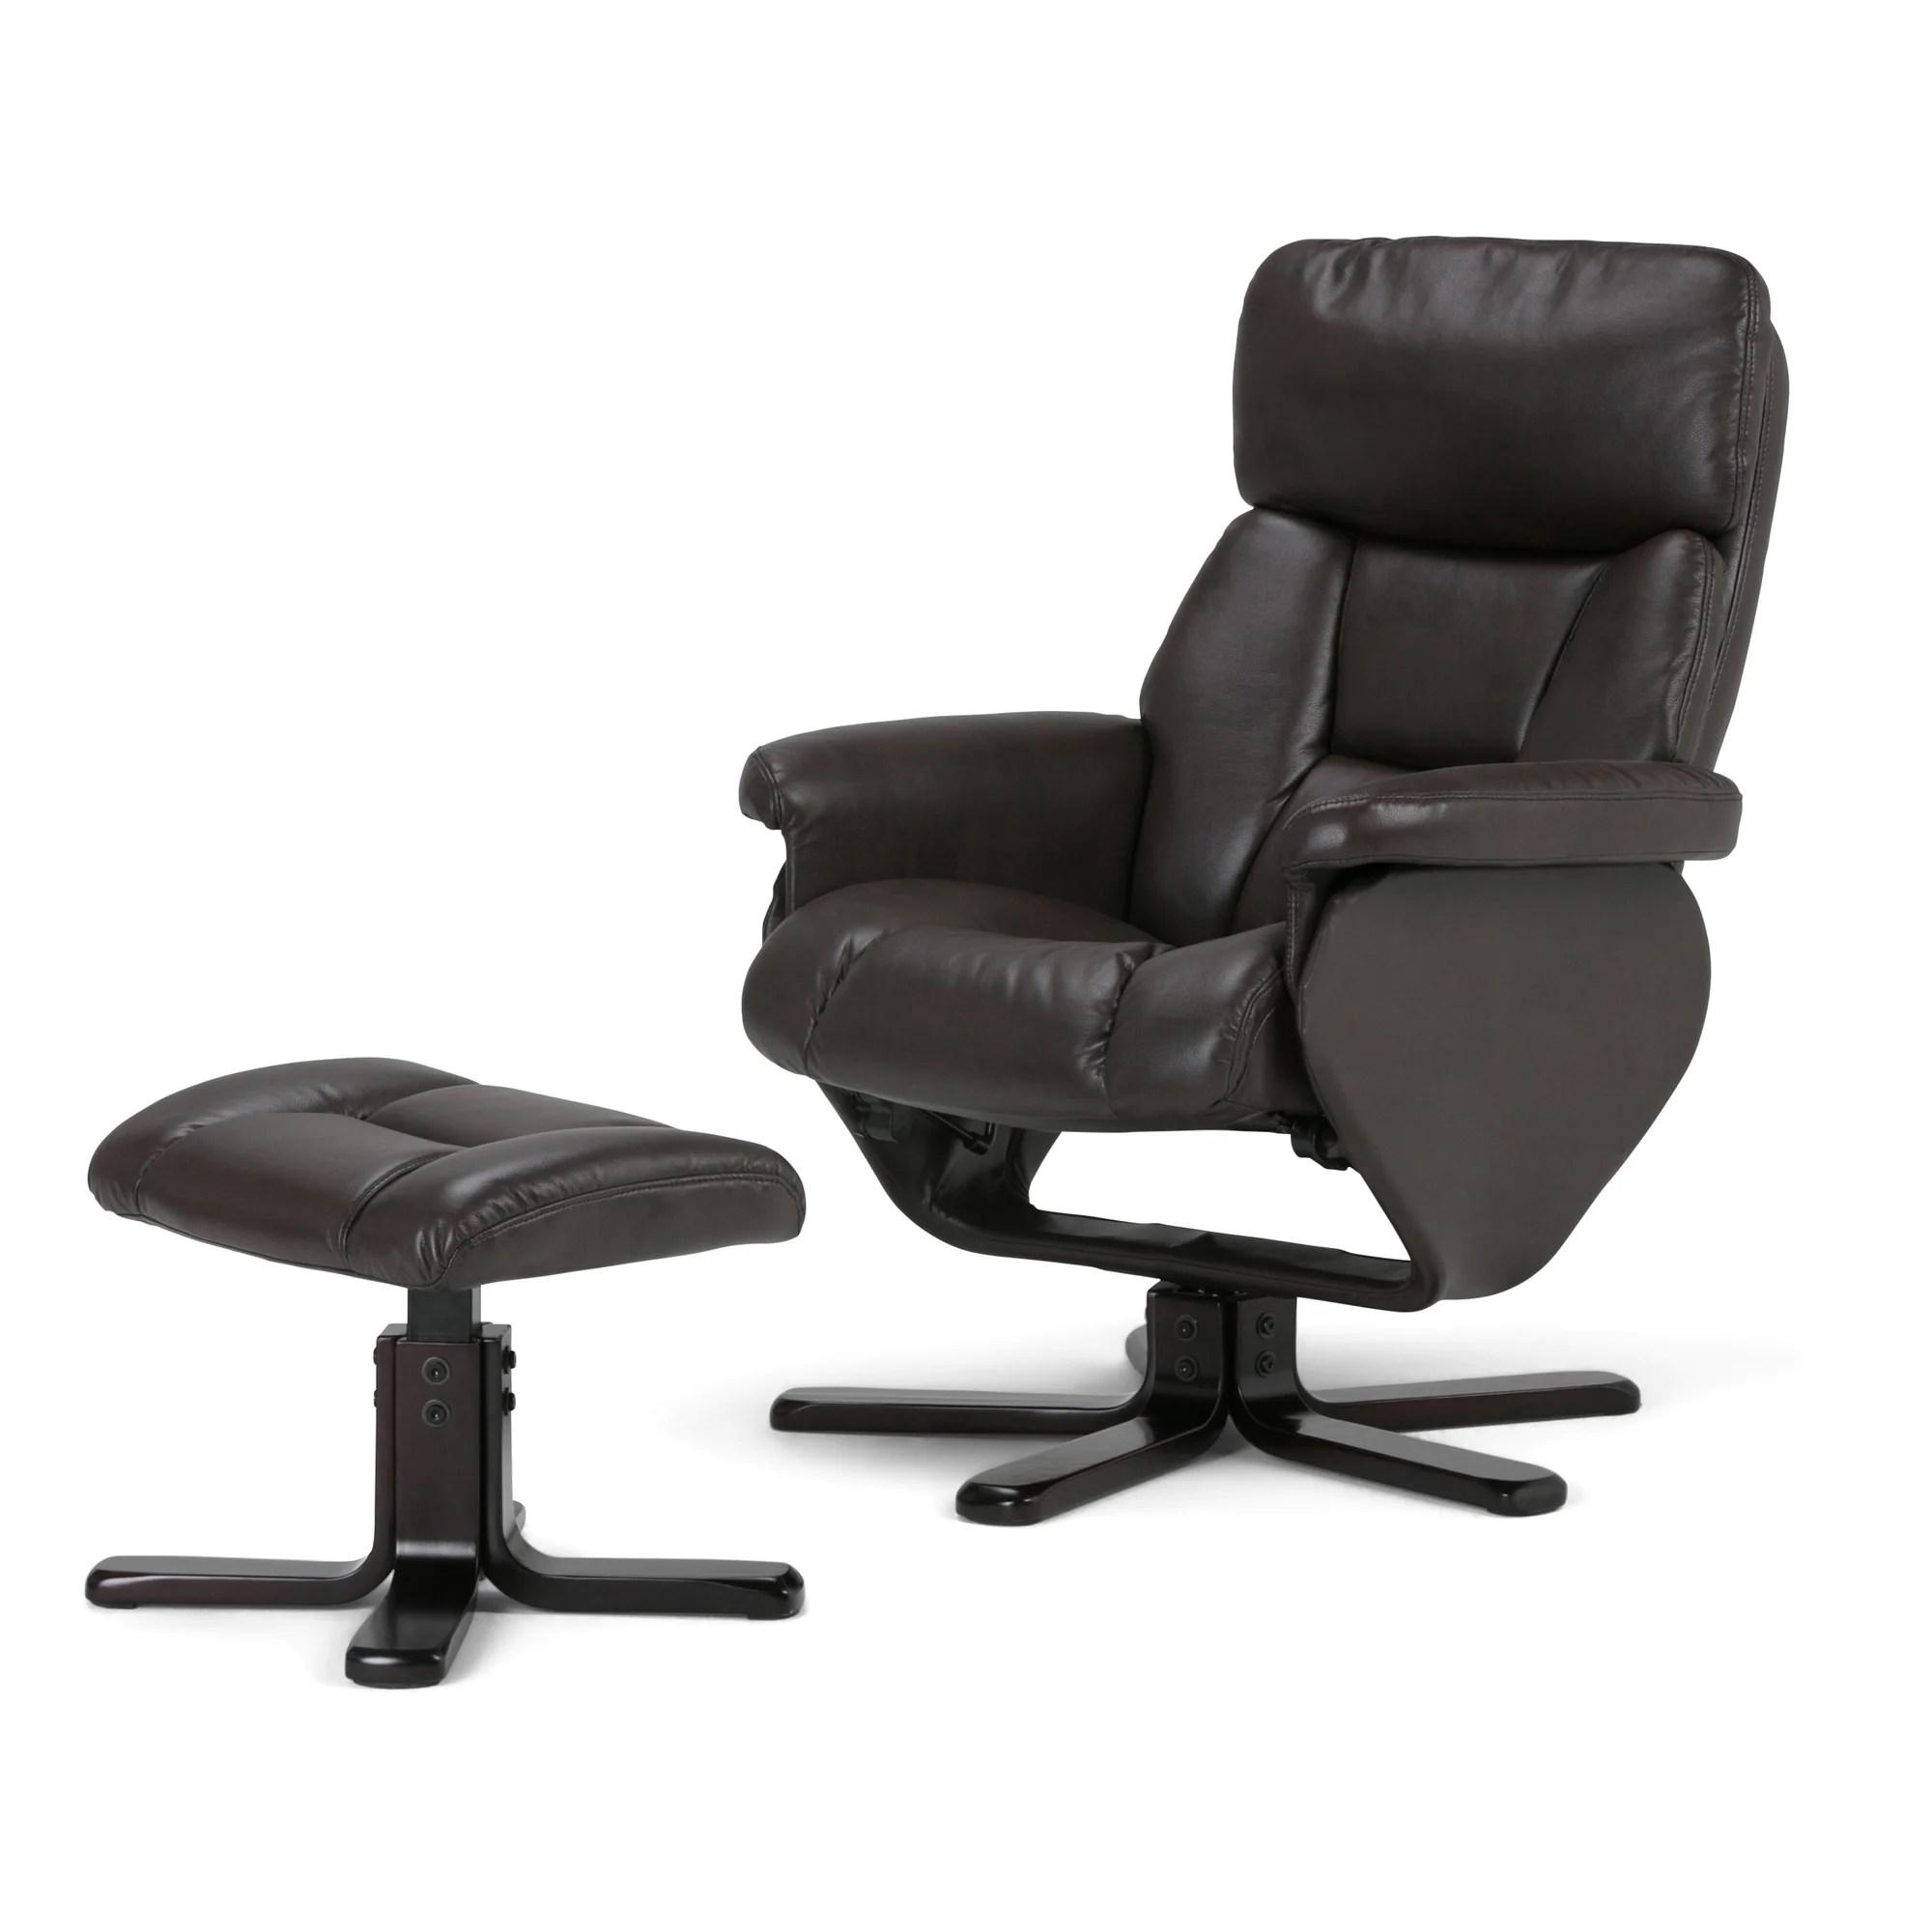 euro recliner chair tractor stool simpli home whitman wayfair ca